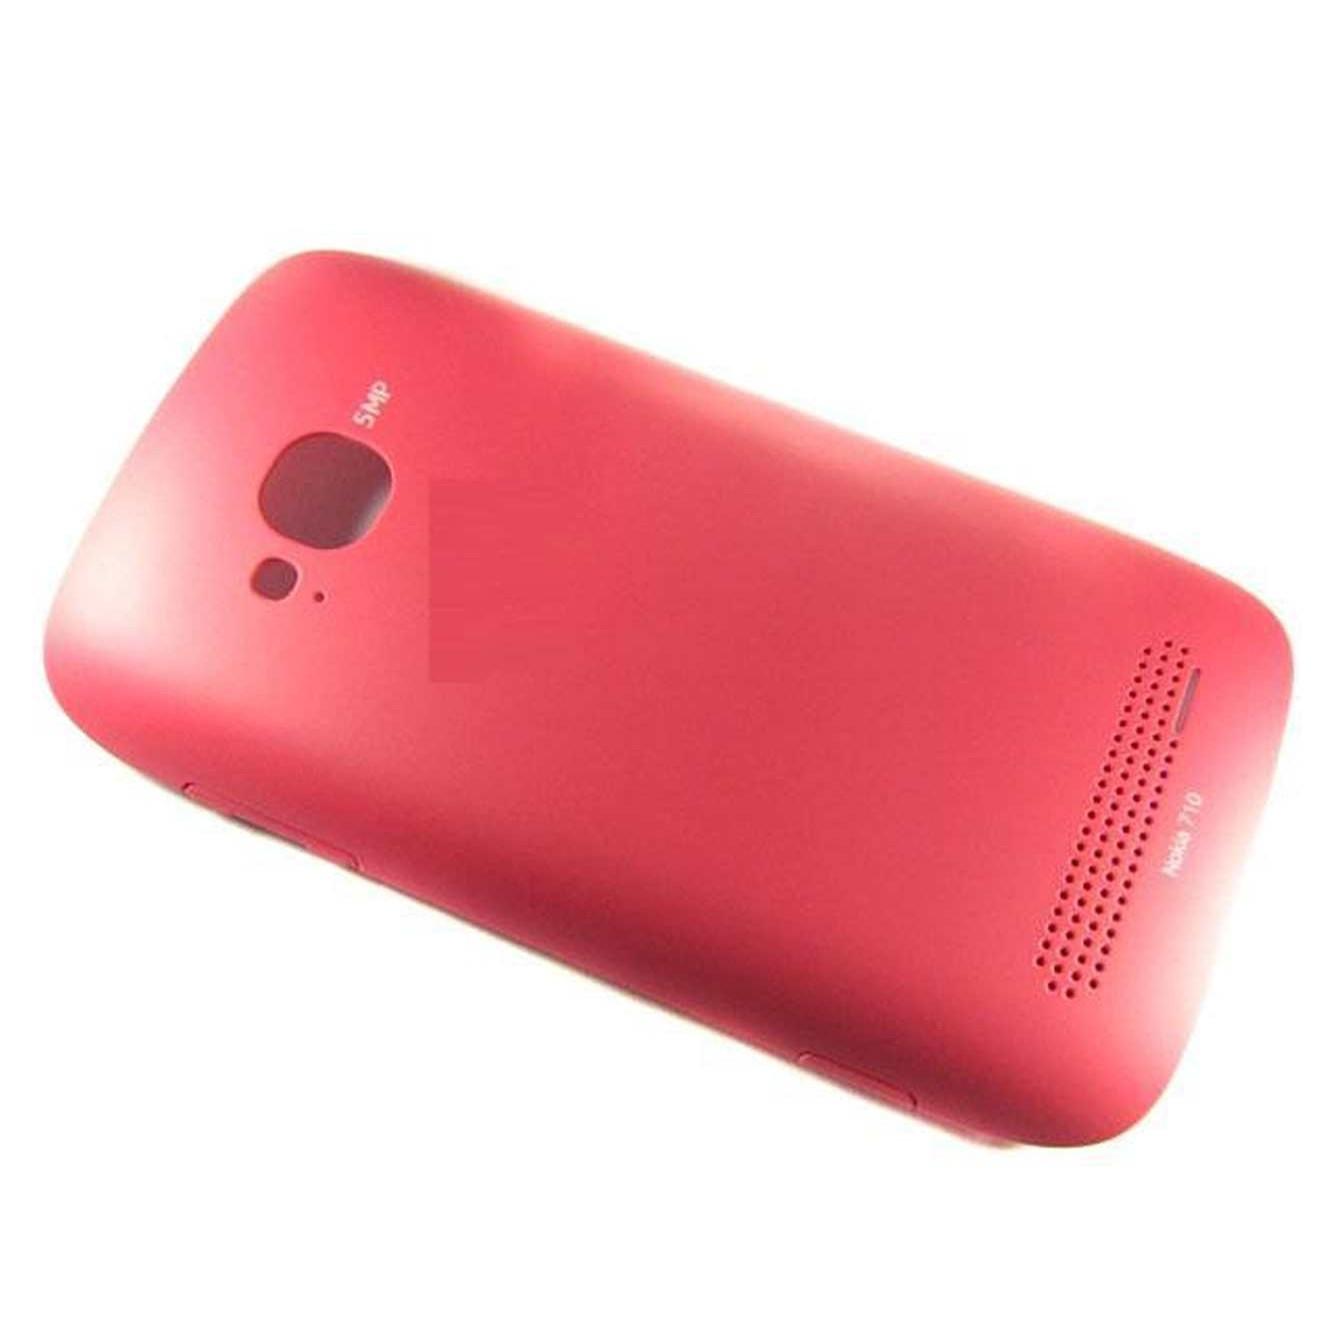 newest e851e 263e0 Back Cover For Nokia Lumia 710 - Red